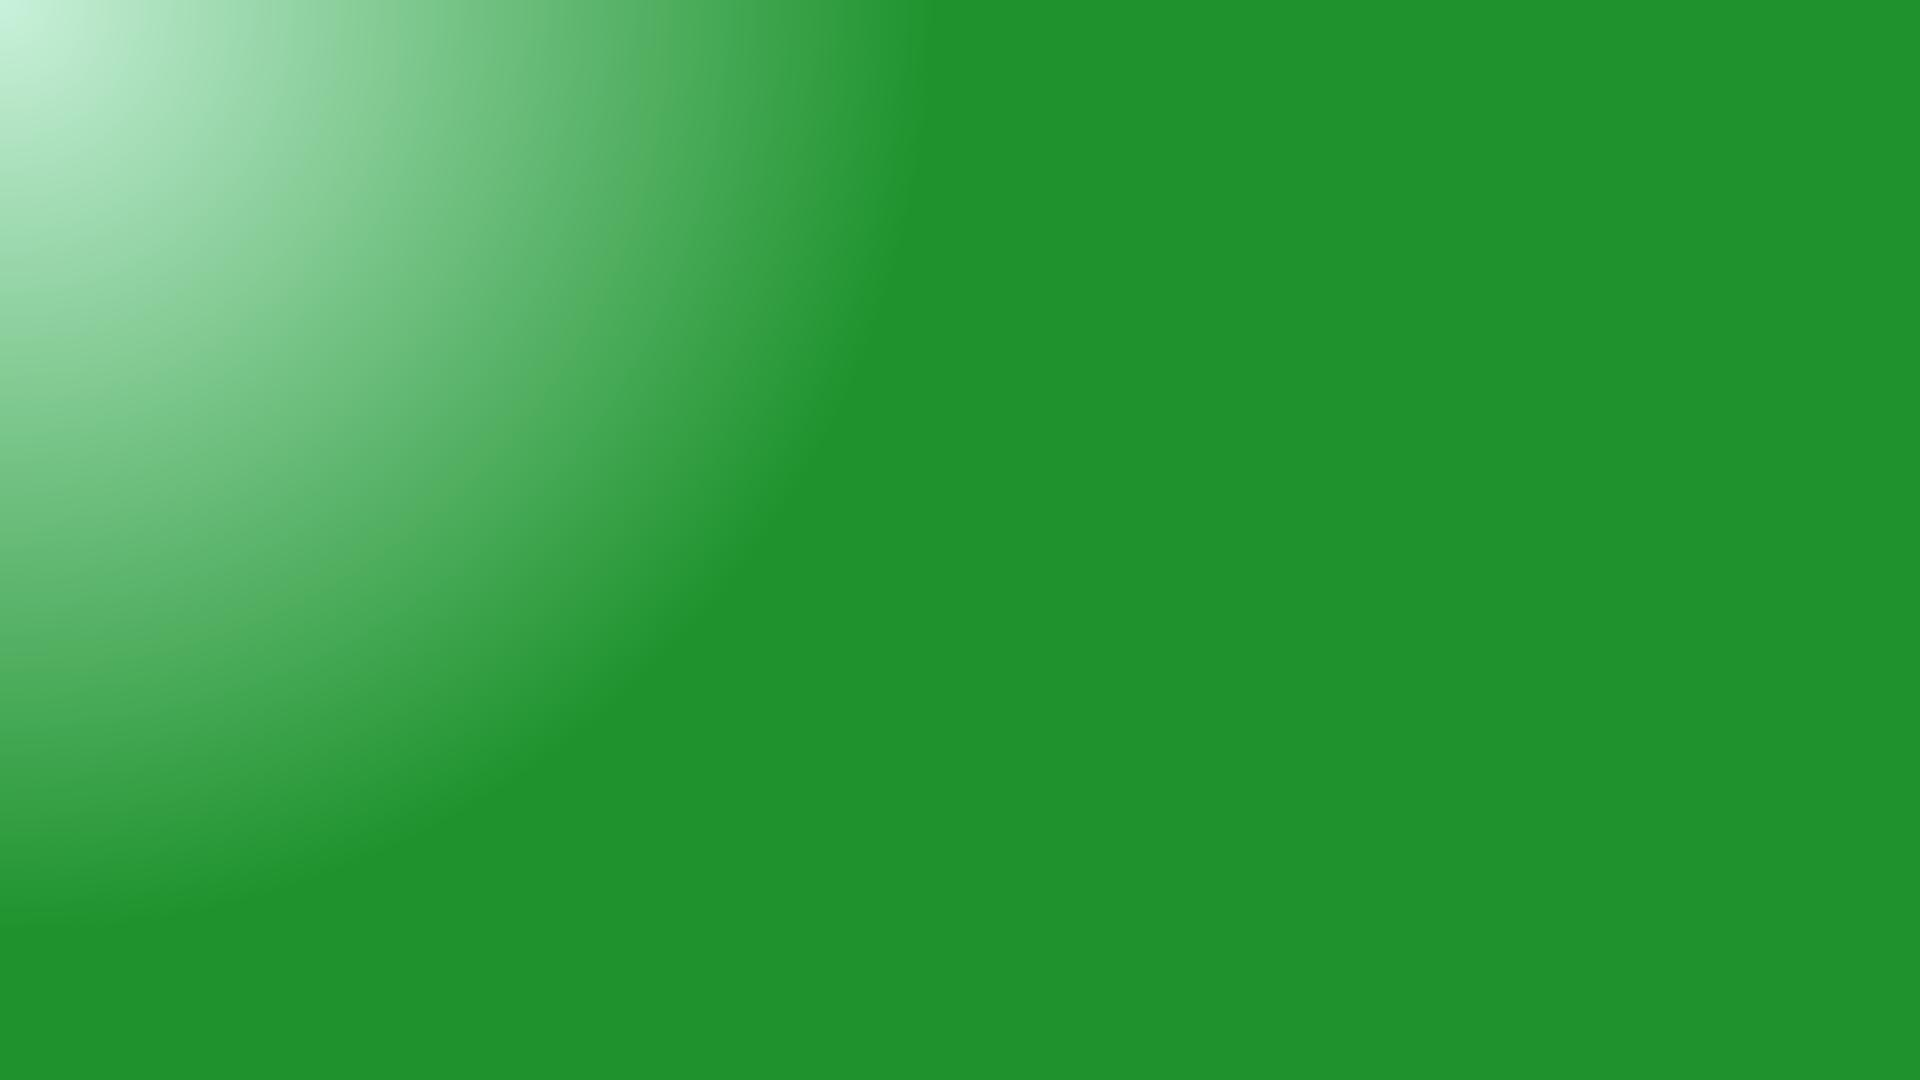 Tree green Gradient